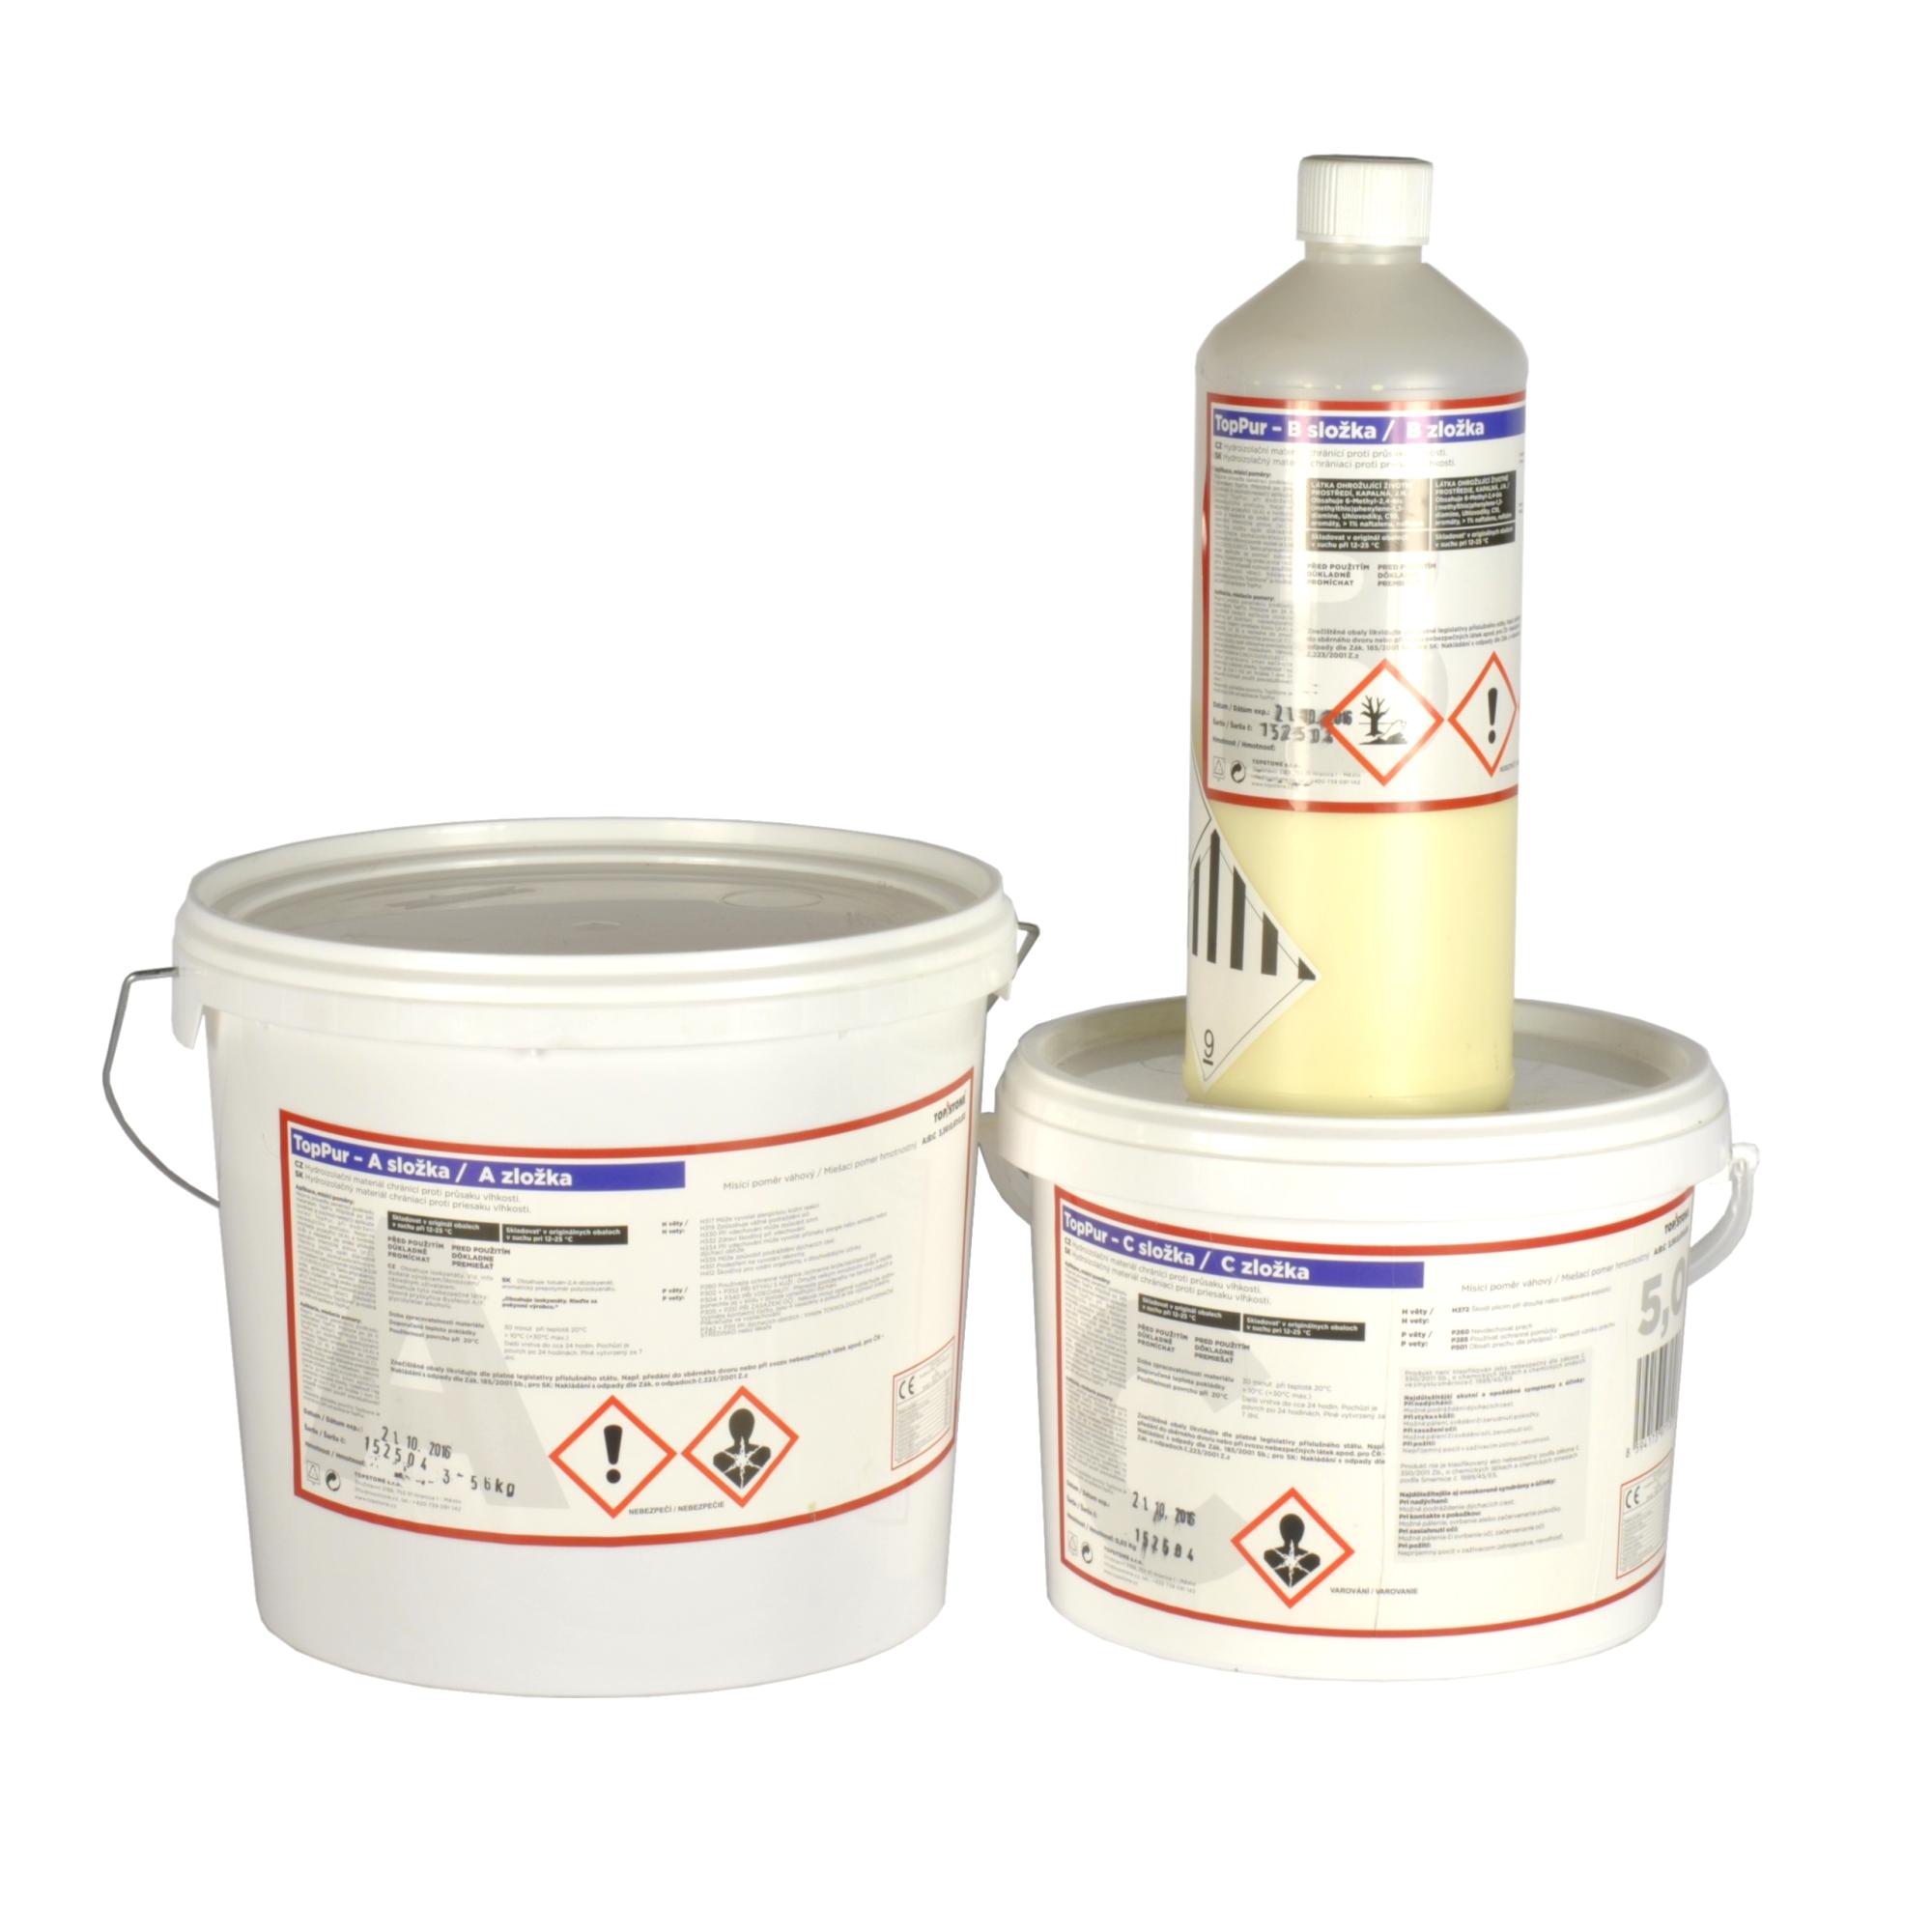 TOPSTONE Top Pur - tekutá polyuretanová hydroizolace